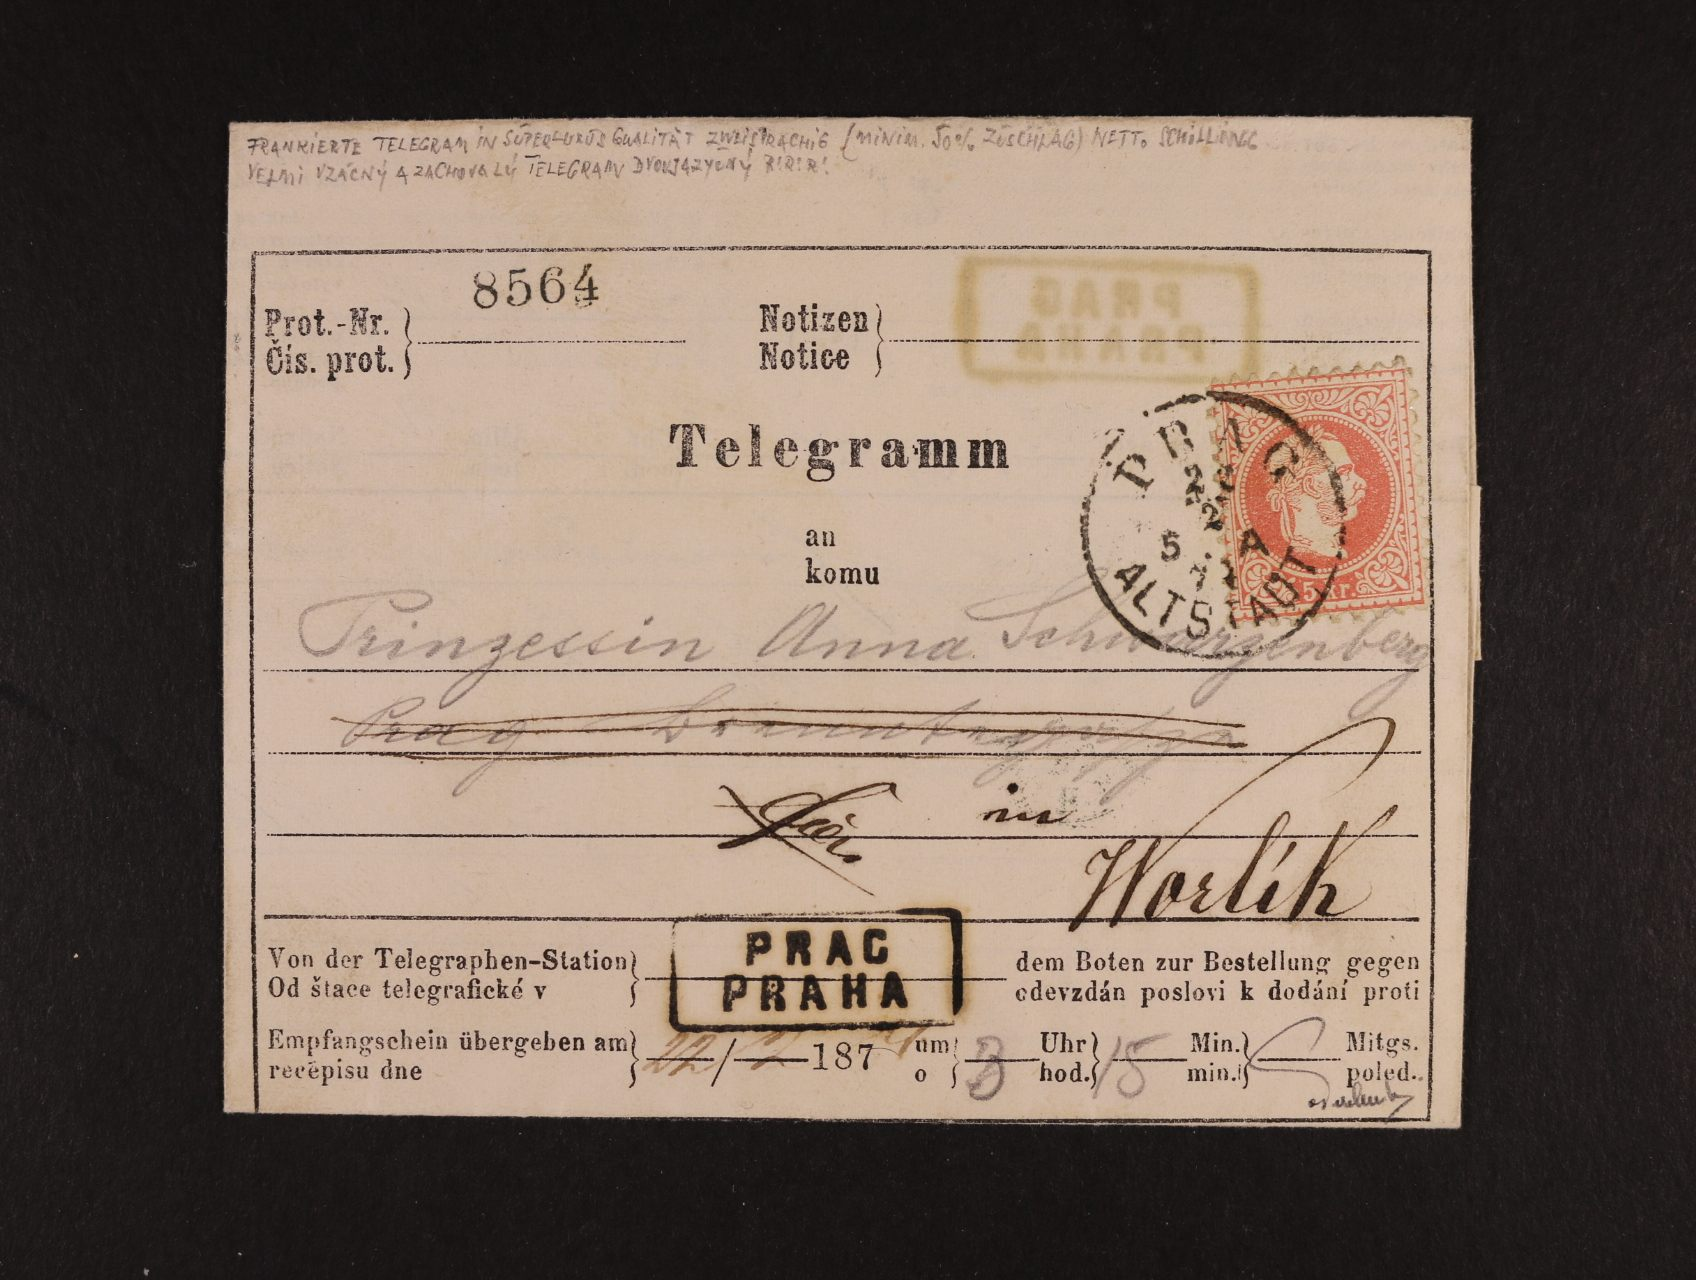 telegram adresovaný na Prinzessin Anna Schwarzenberg in Worlik, frank. zn. Fe. č. 37 I, typ IIa, pod. raz. PRAG 22.2.1874, přídavné rámeč. raz. PRAG PRAHA, přích. modré náprstkové raz. WORLIK 22.2.74, zk. a atest Ferchenbauer, lux. kvalita,